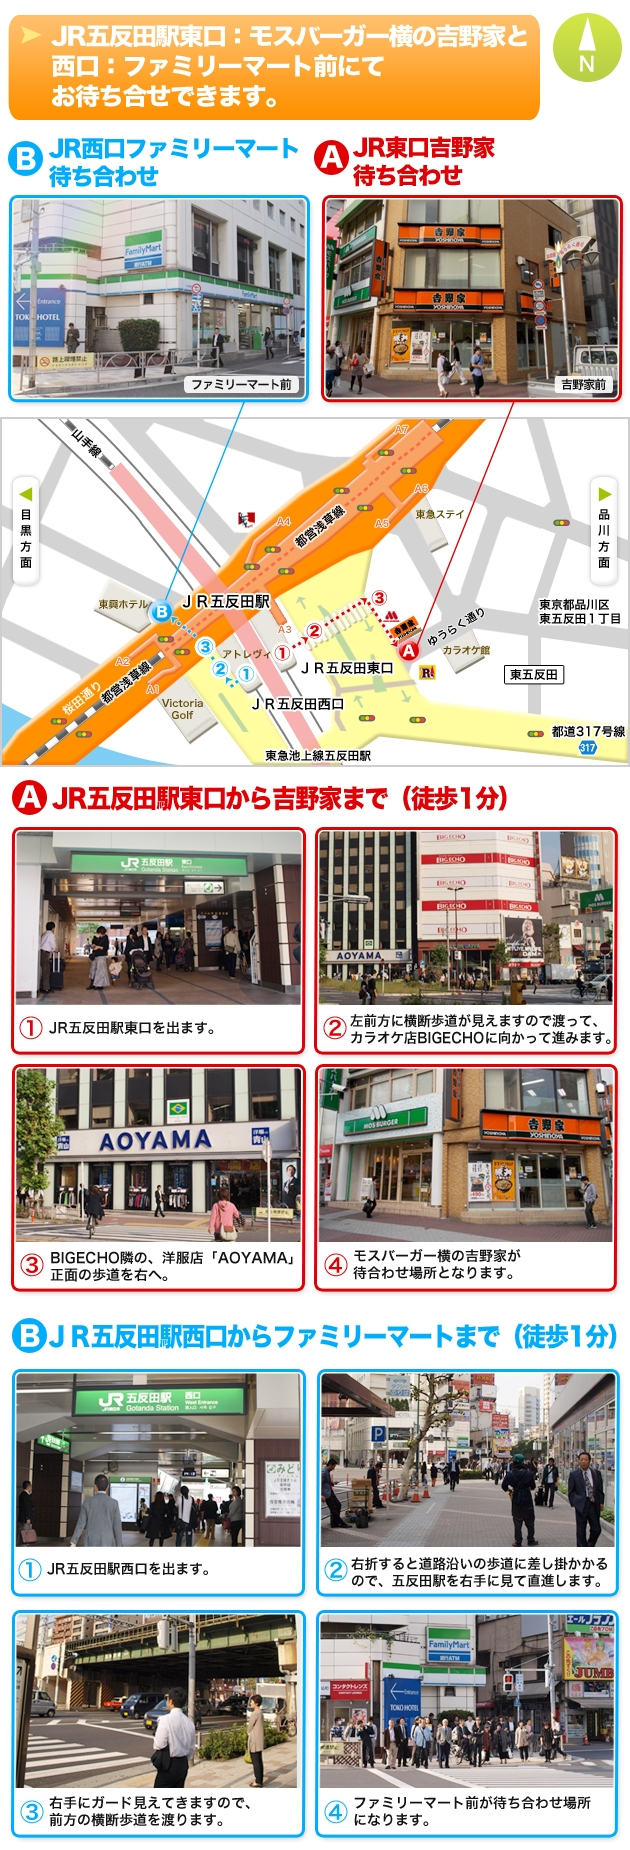 JR東口吉野家前、JR西口ファミリーマート前